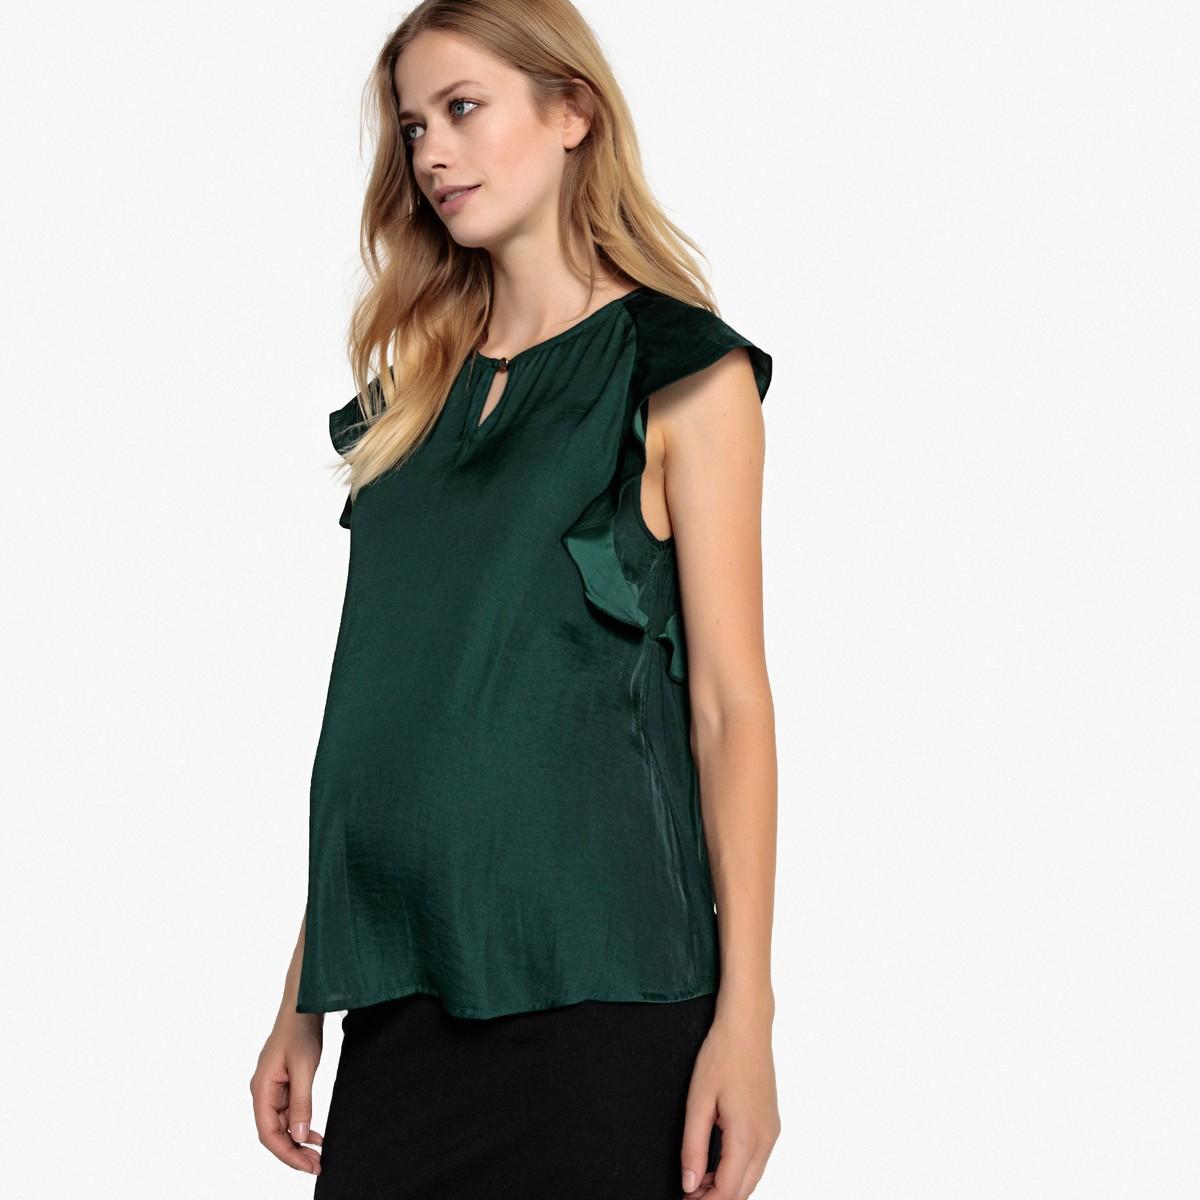 04dba6018782 LA REDOUTE COLLECTIONS Μπλούζα εγκυμοσύνης με βολάν στα μανίκαι ...